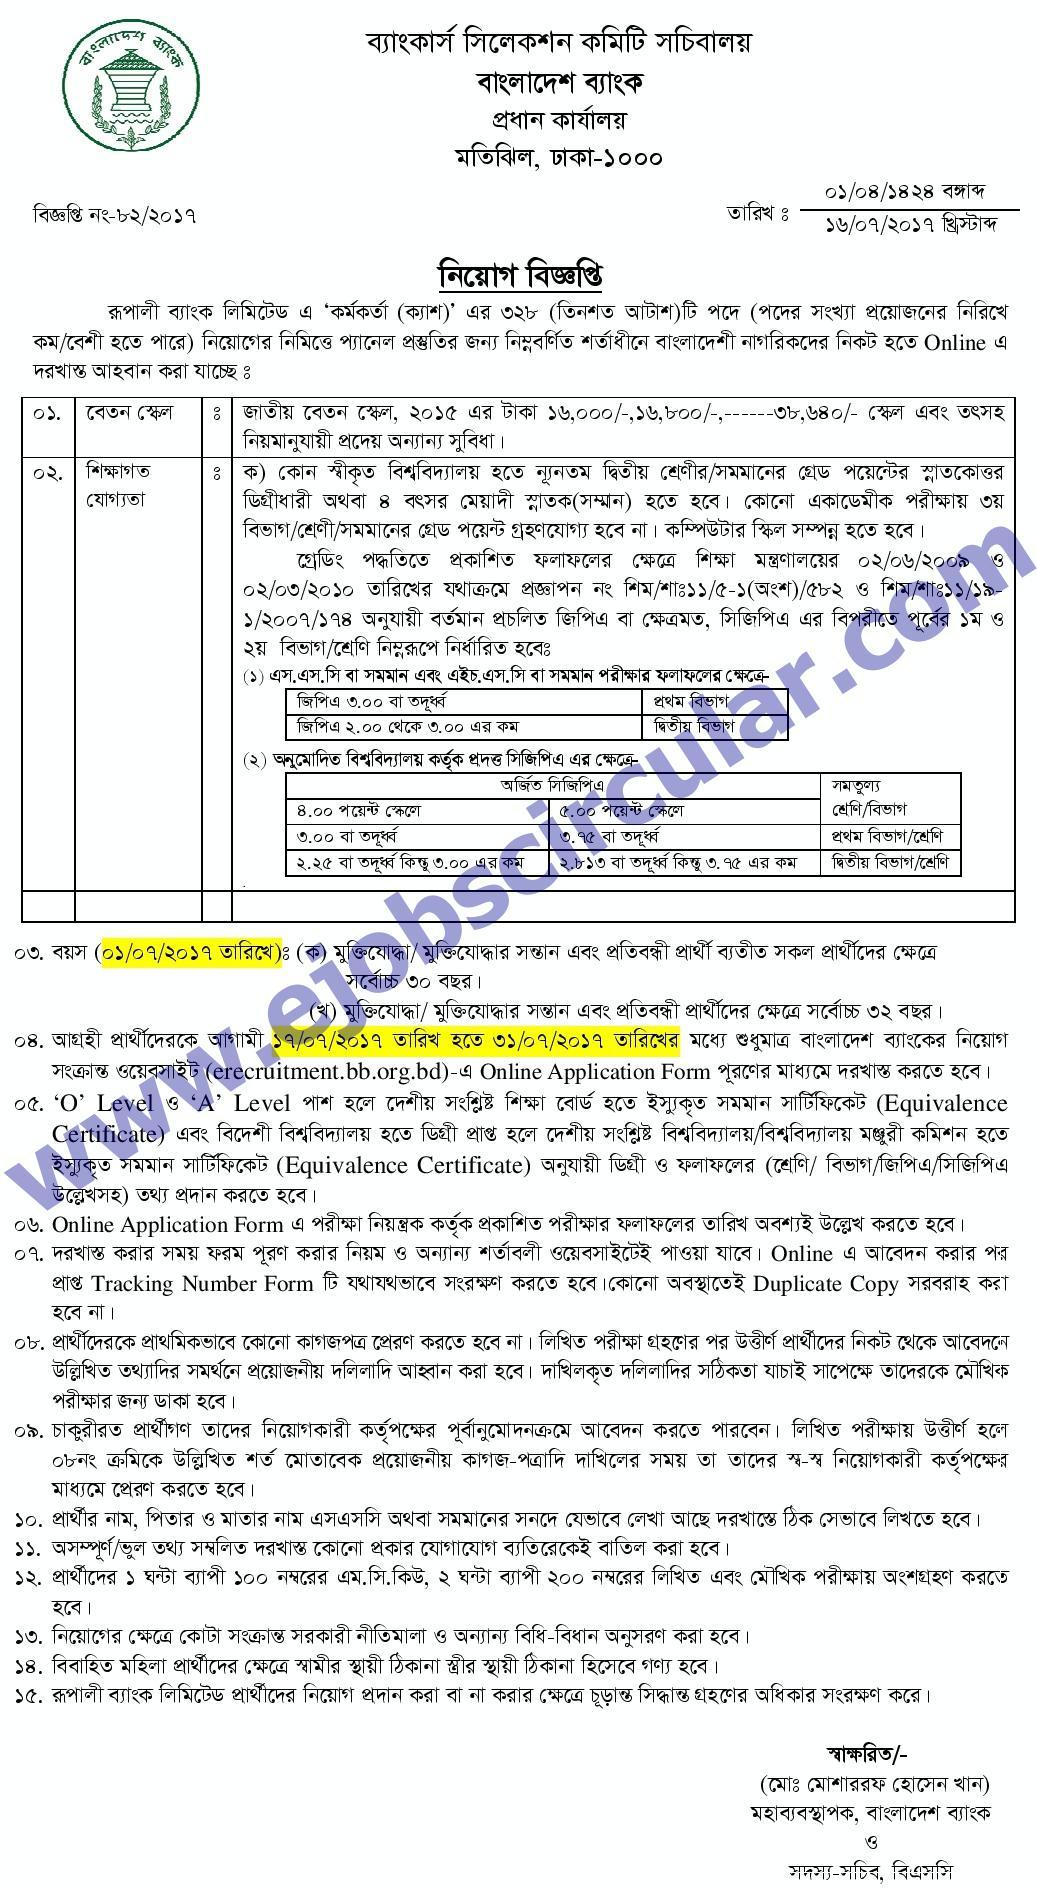 Rupali Bank Limited Job Circular Exam Notice